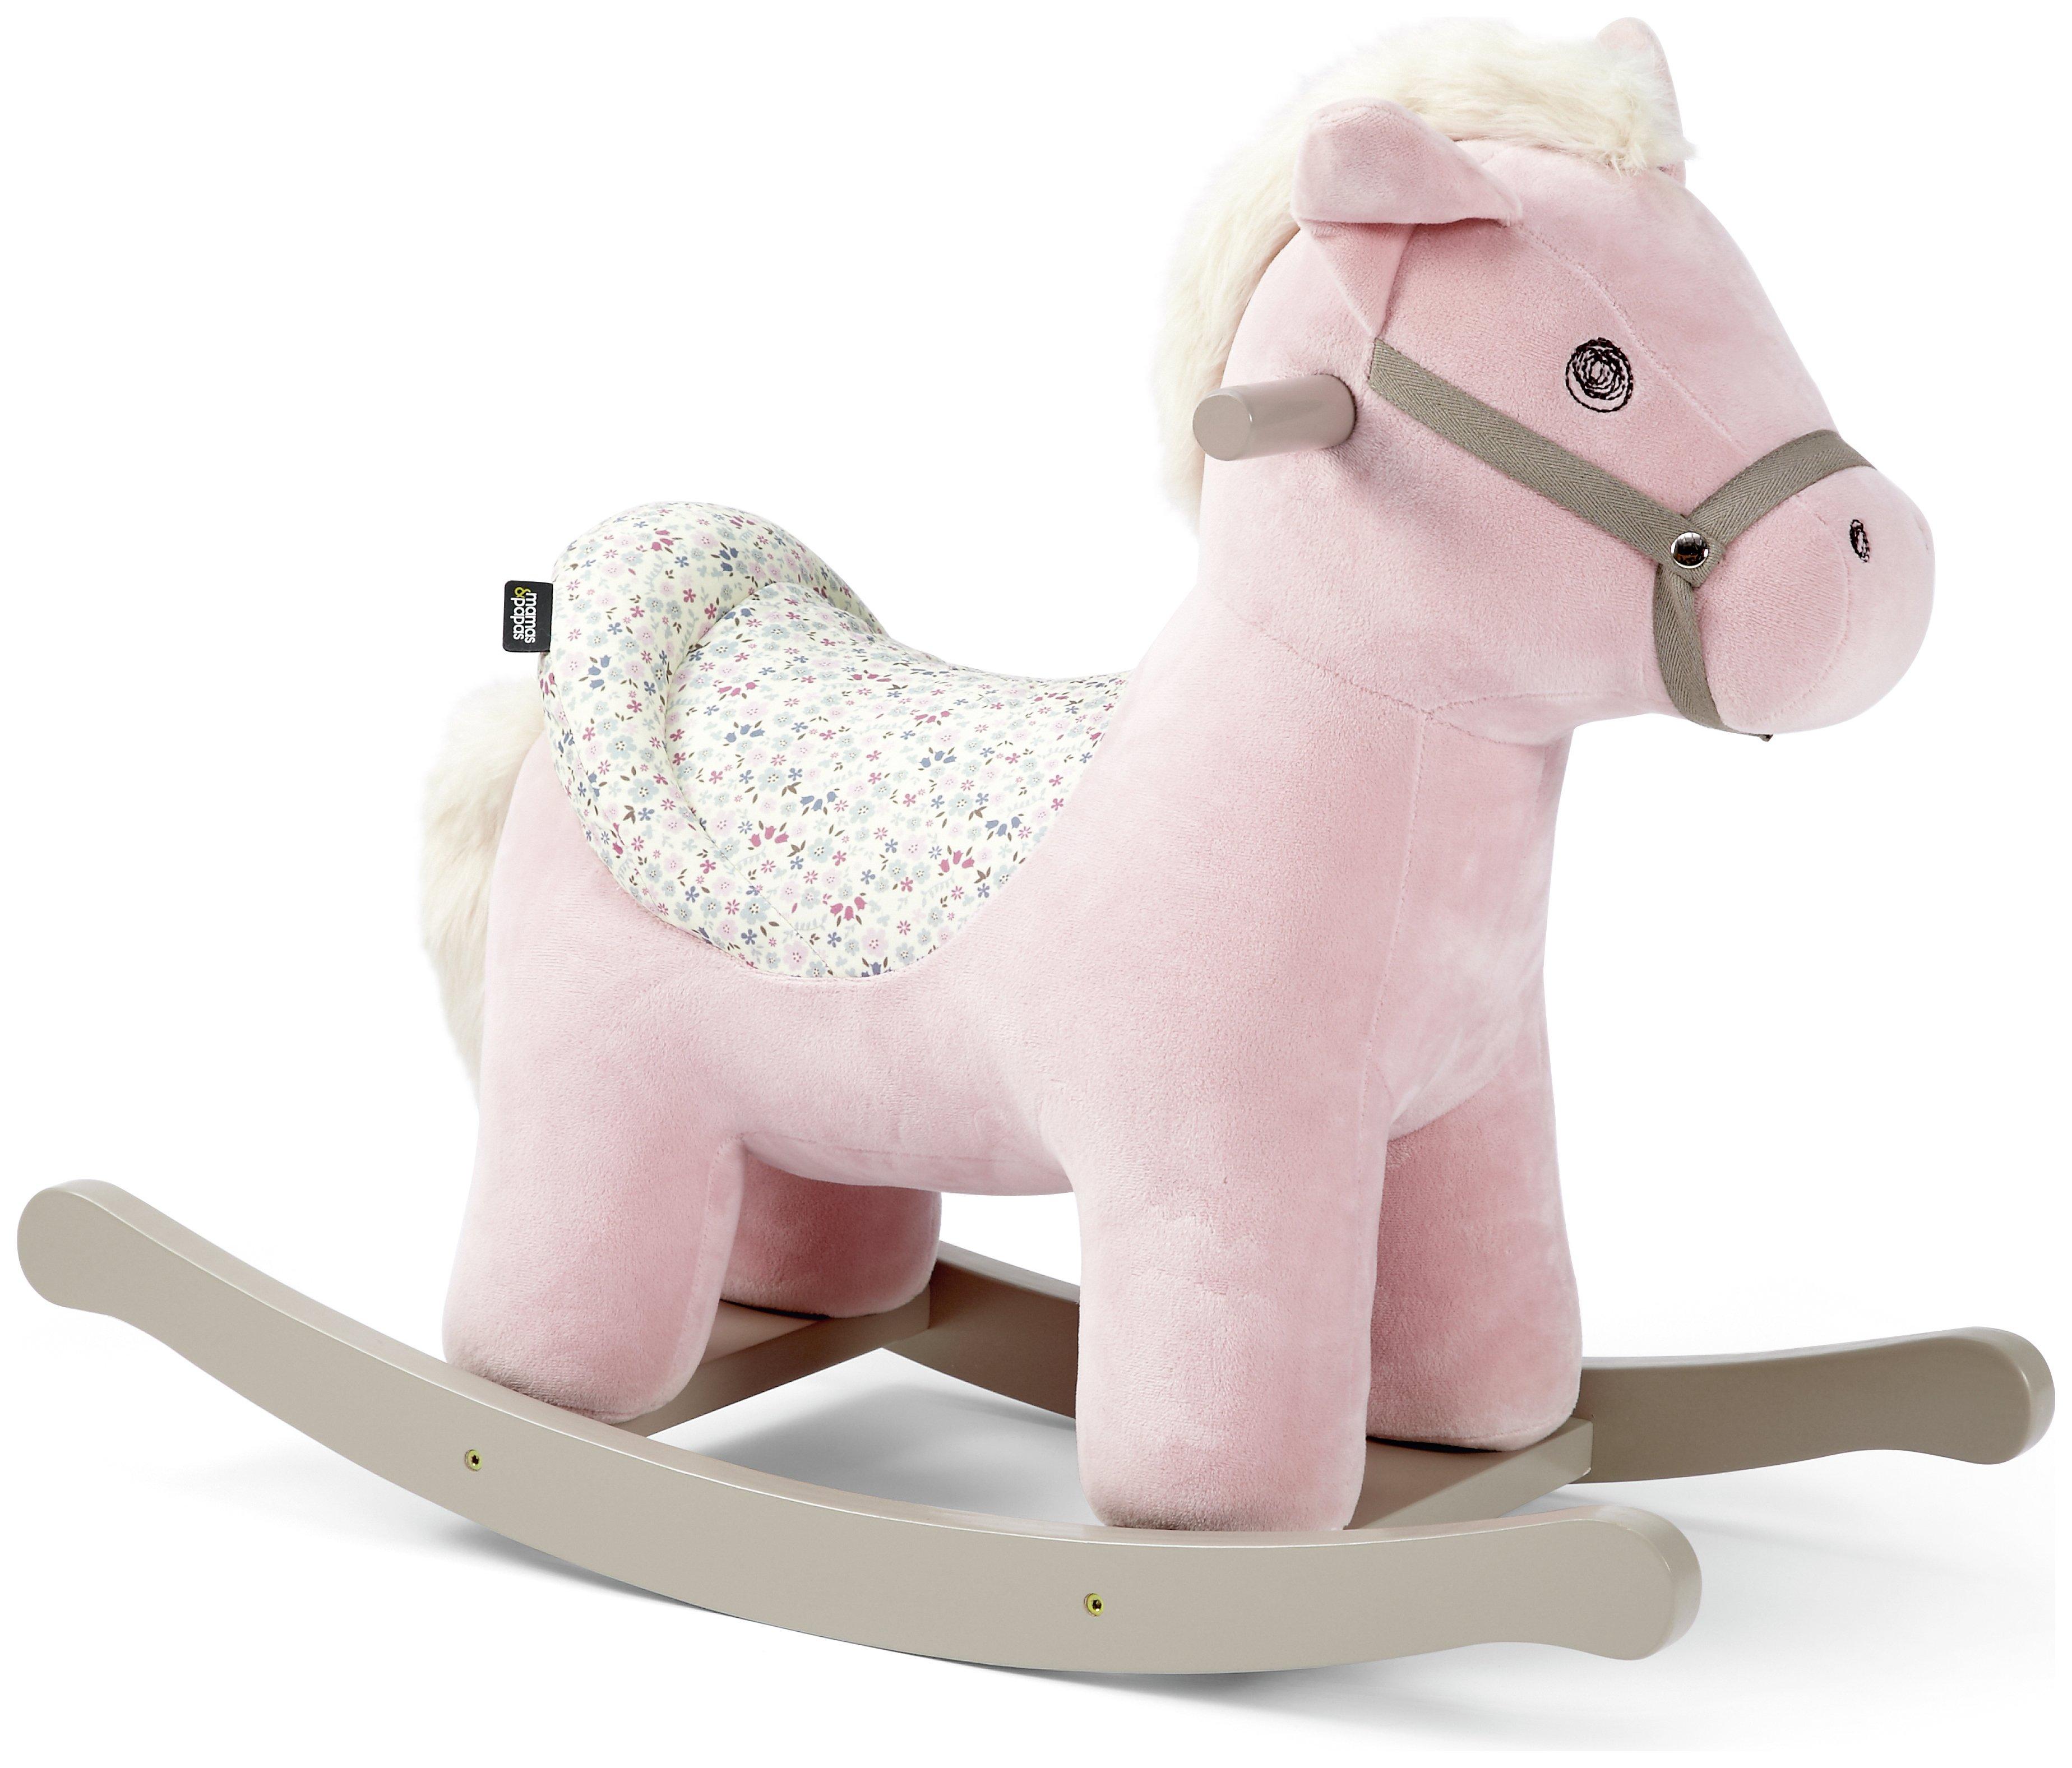 Image of Mamas & Papas Livy Rocking Horse.